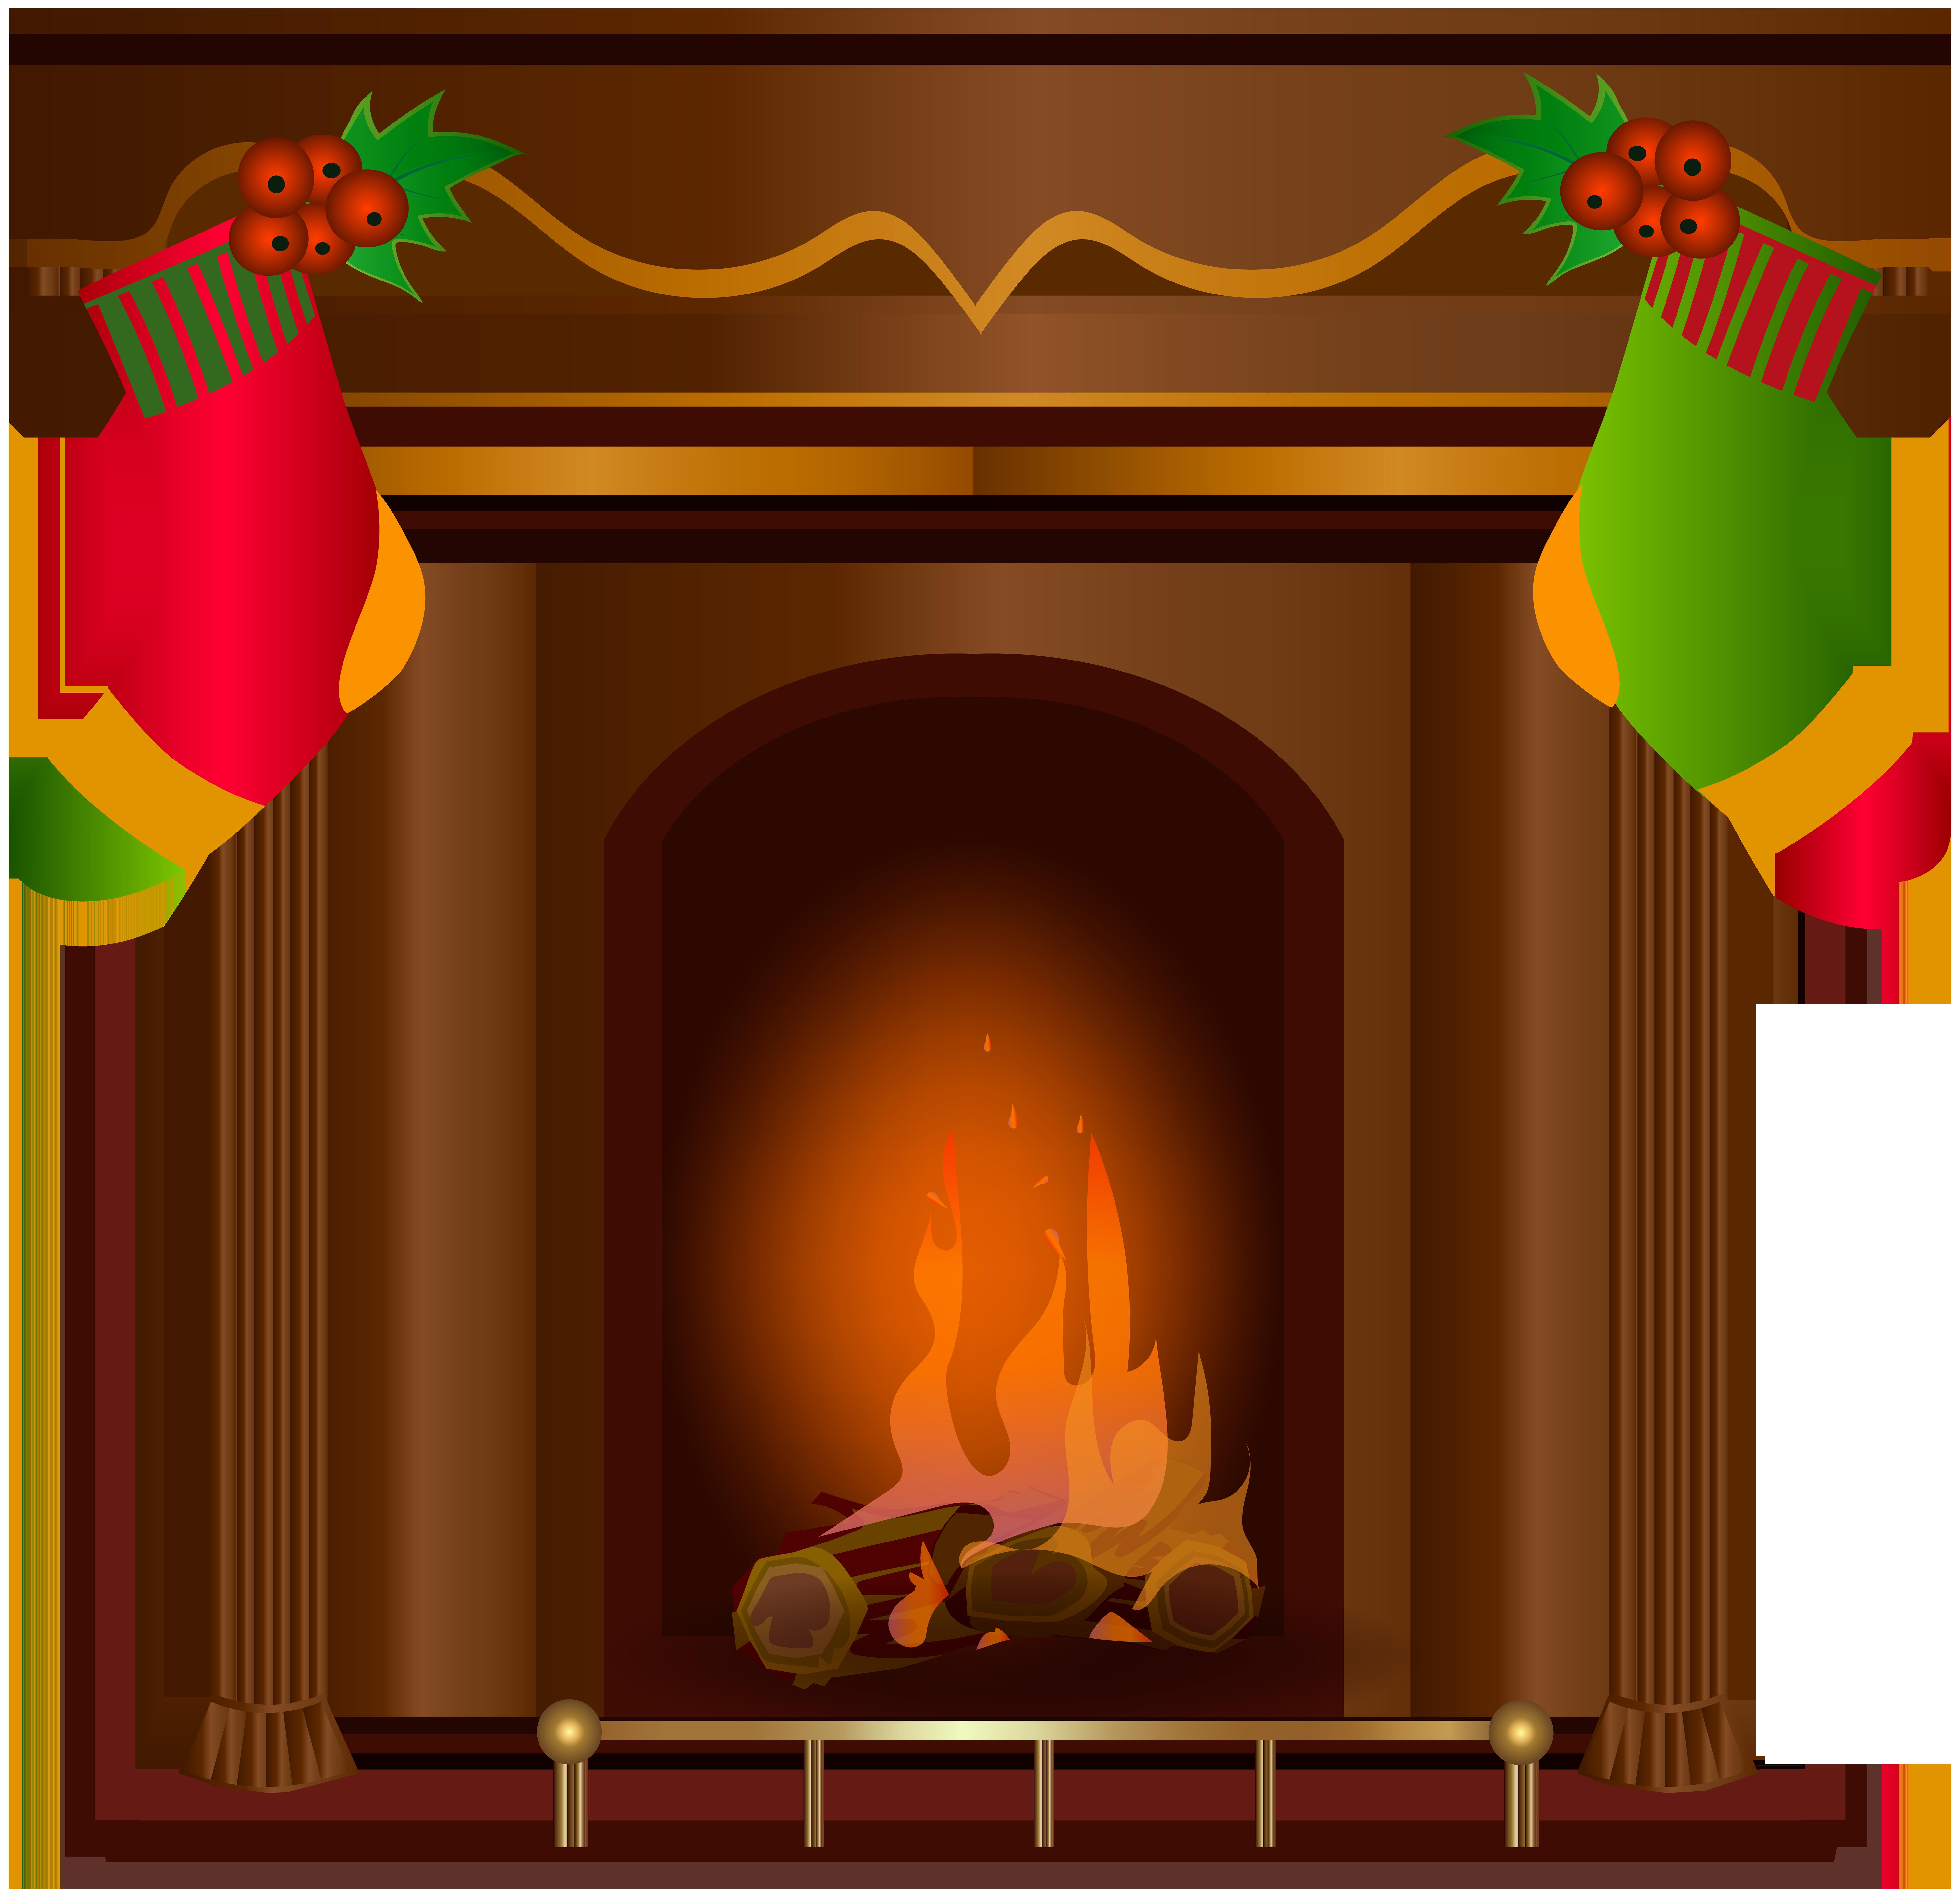 clipart fire chimney fire